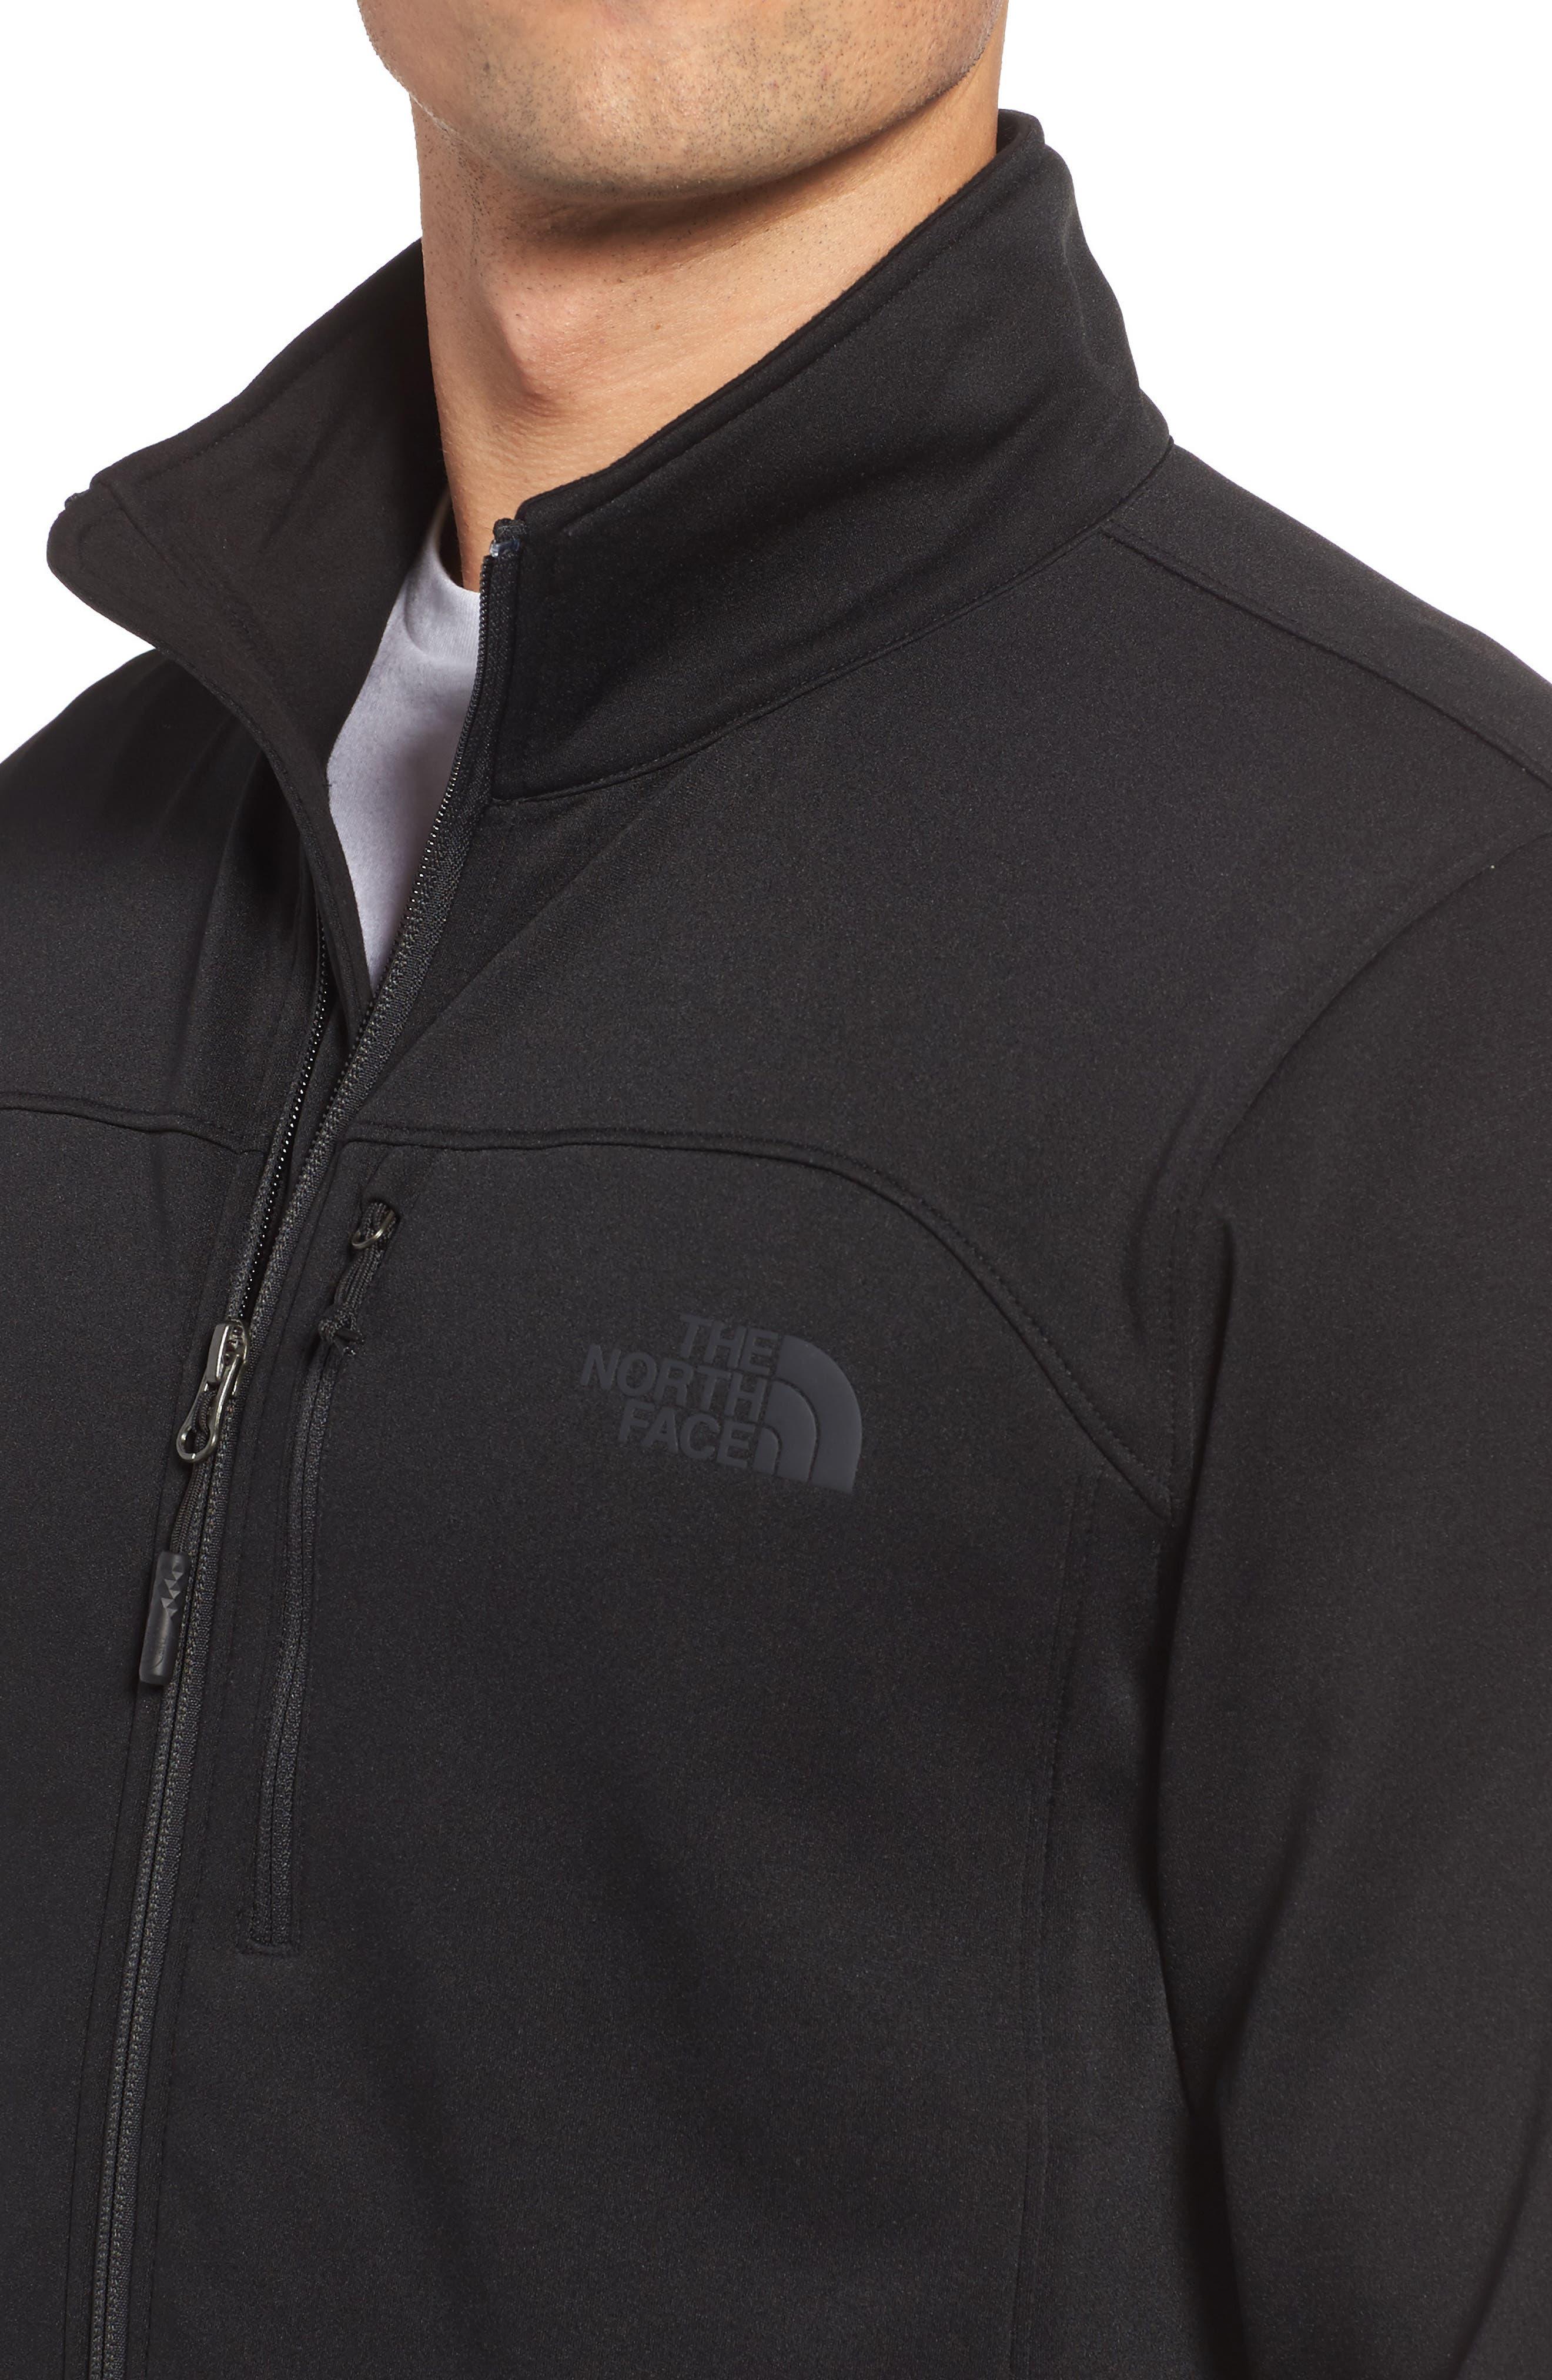 'Momentum' Fleece Jacket,                             Alternate thumbnail 4, color,                             TNF BLACK